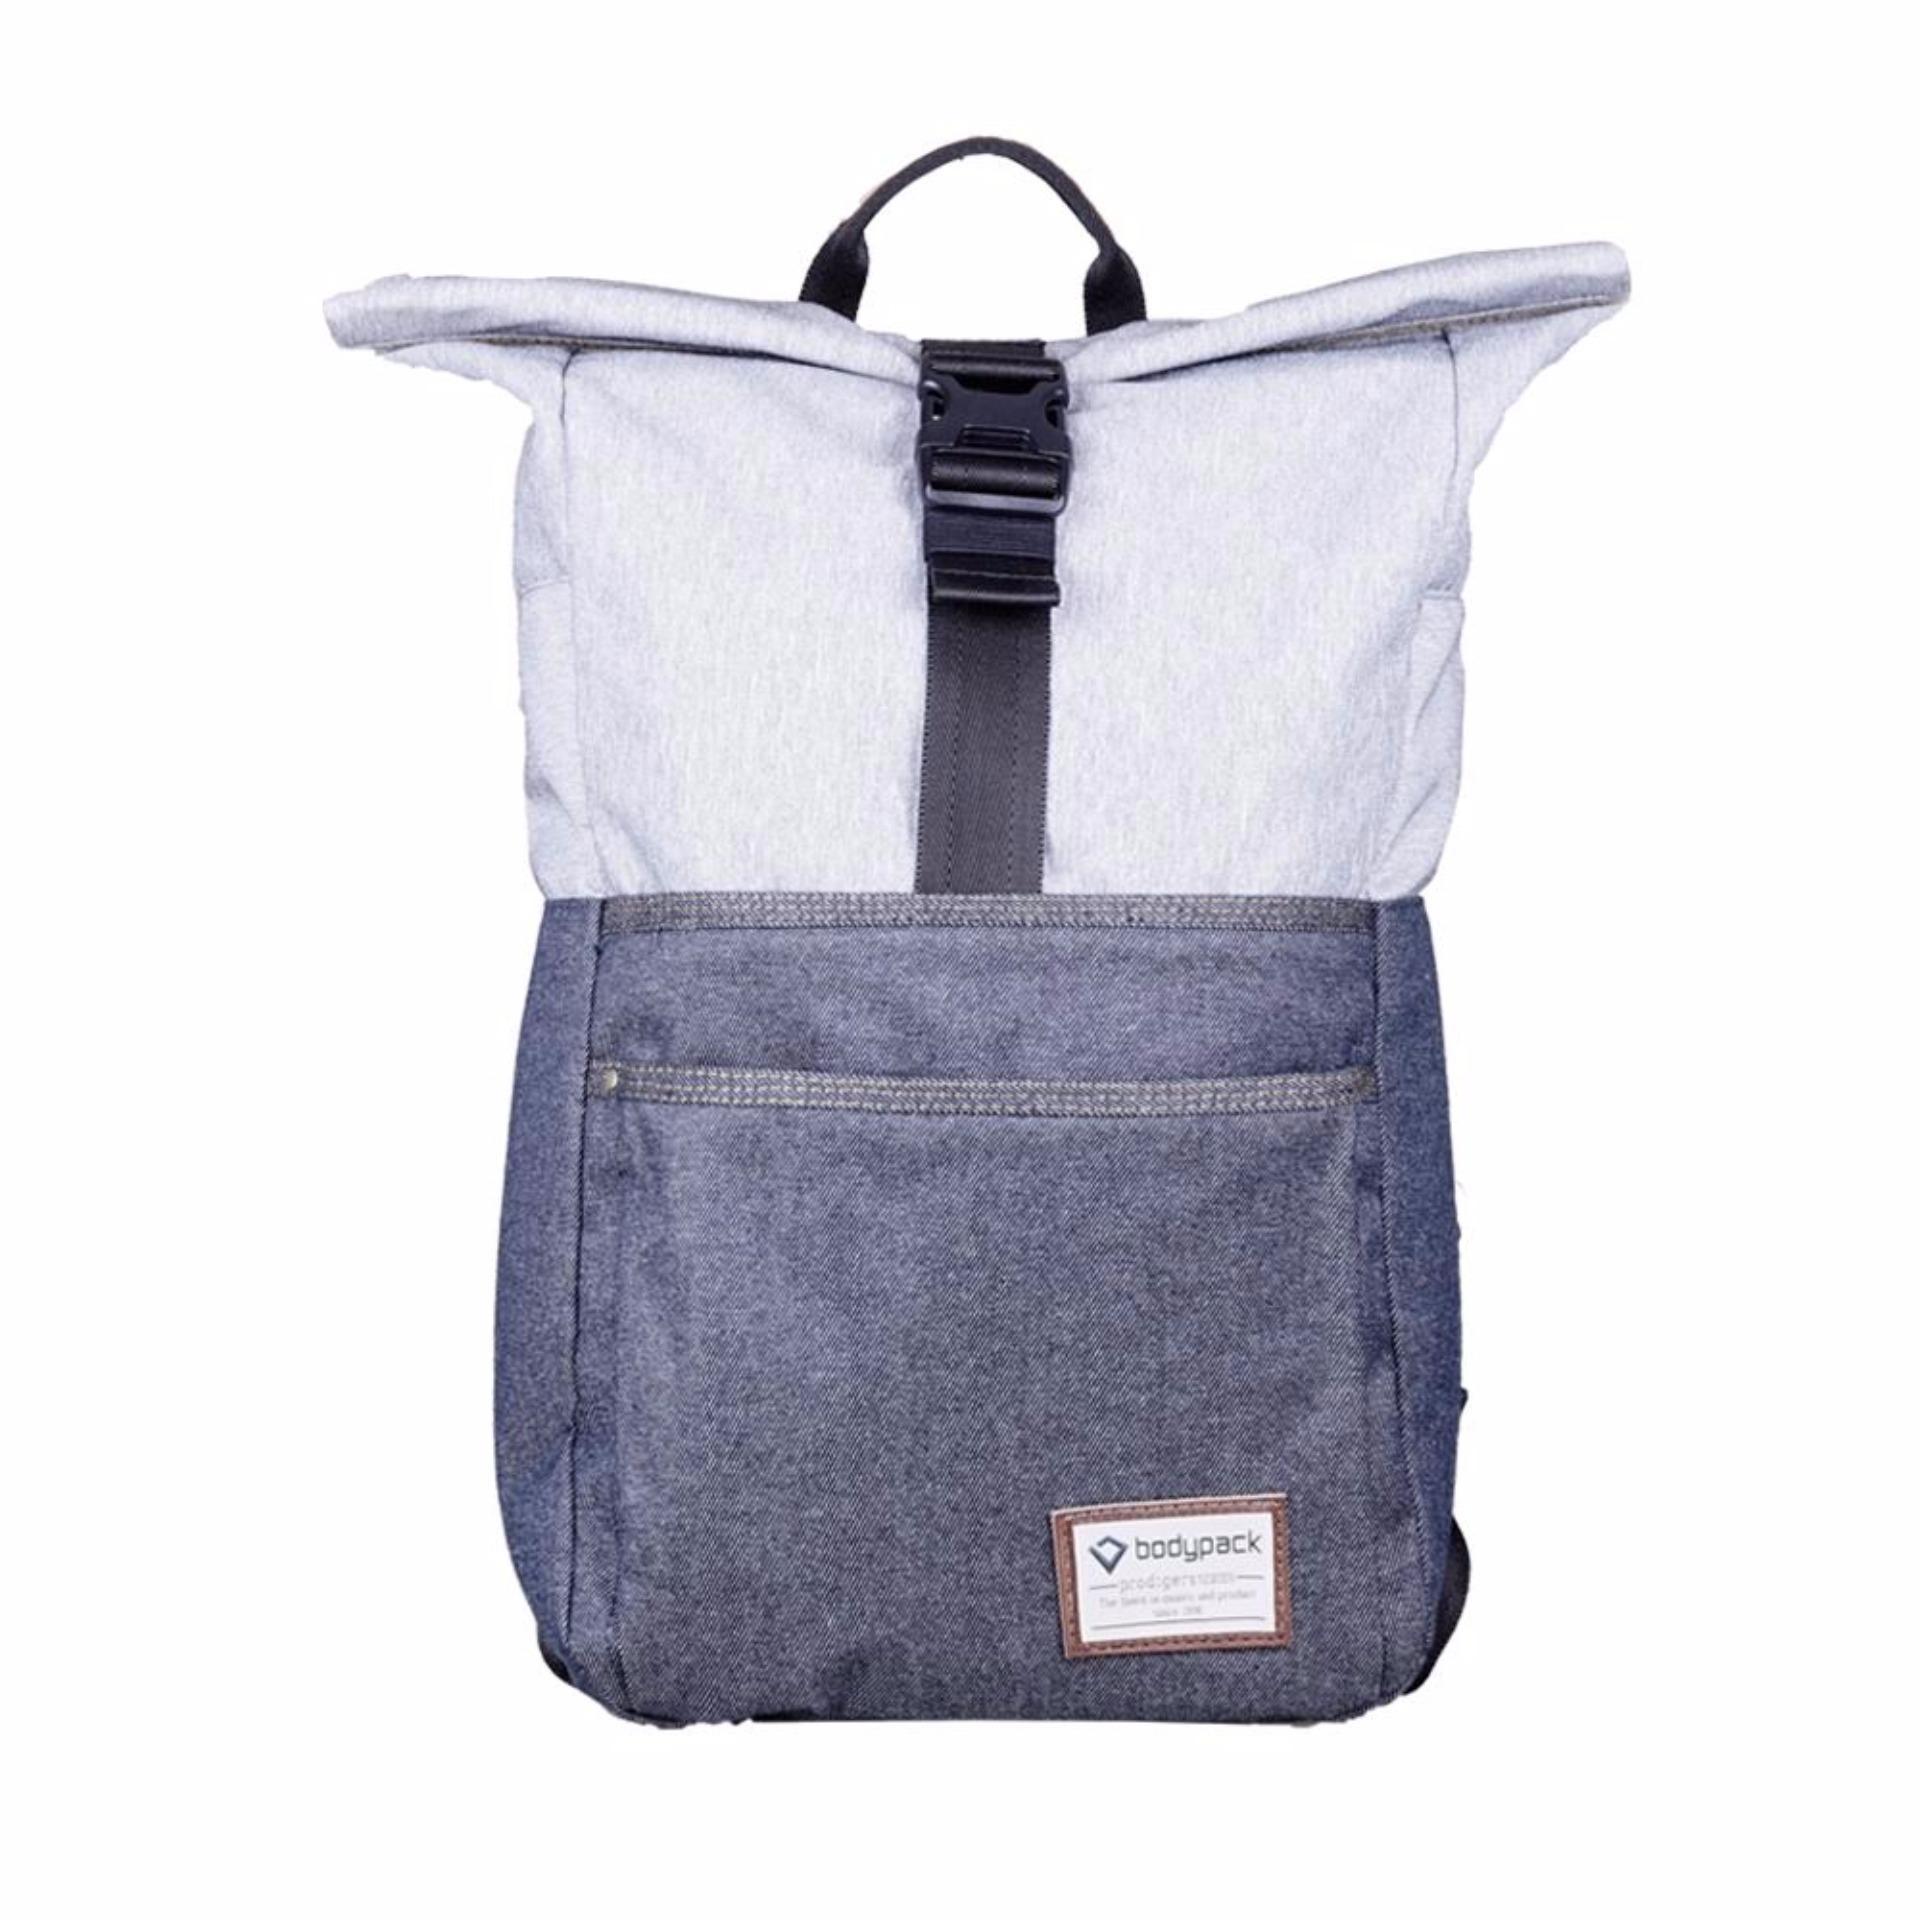 Bodypack Tsi Pad Loader 021 Hitam Rlt14 Companion 40 3logic Tab Abu Cek Harga Terkini Dan